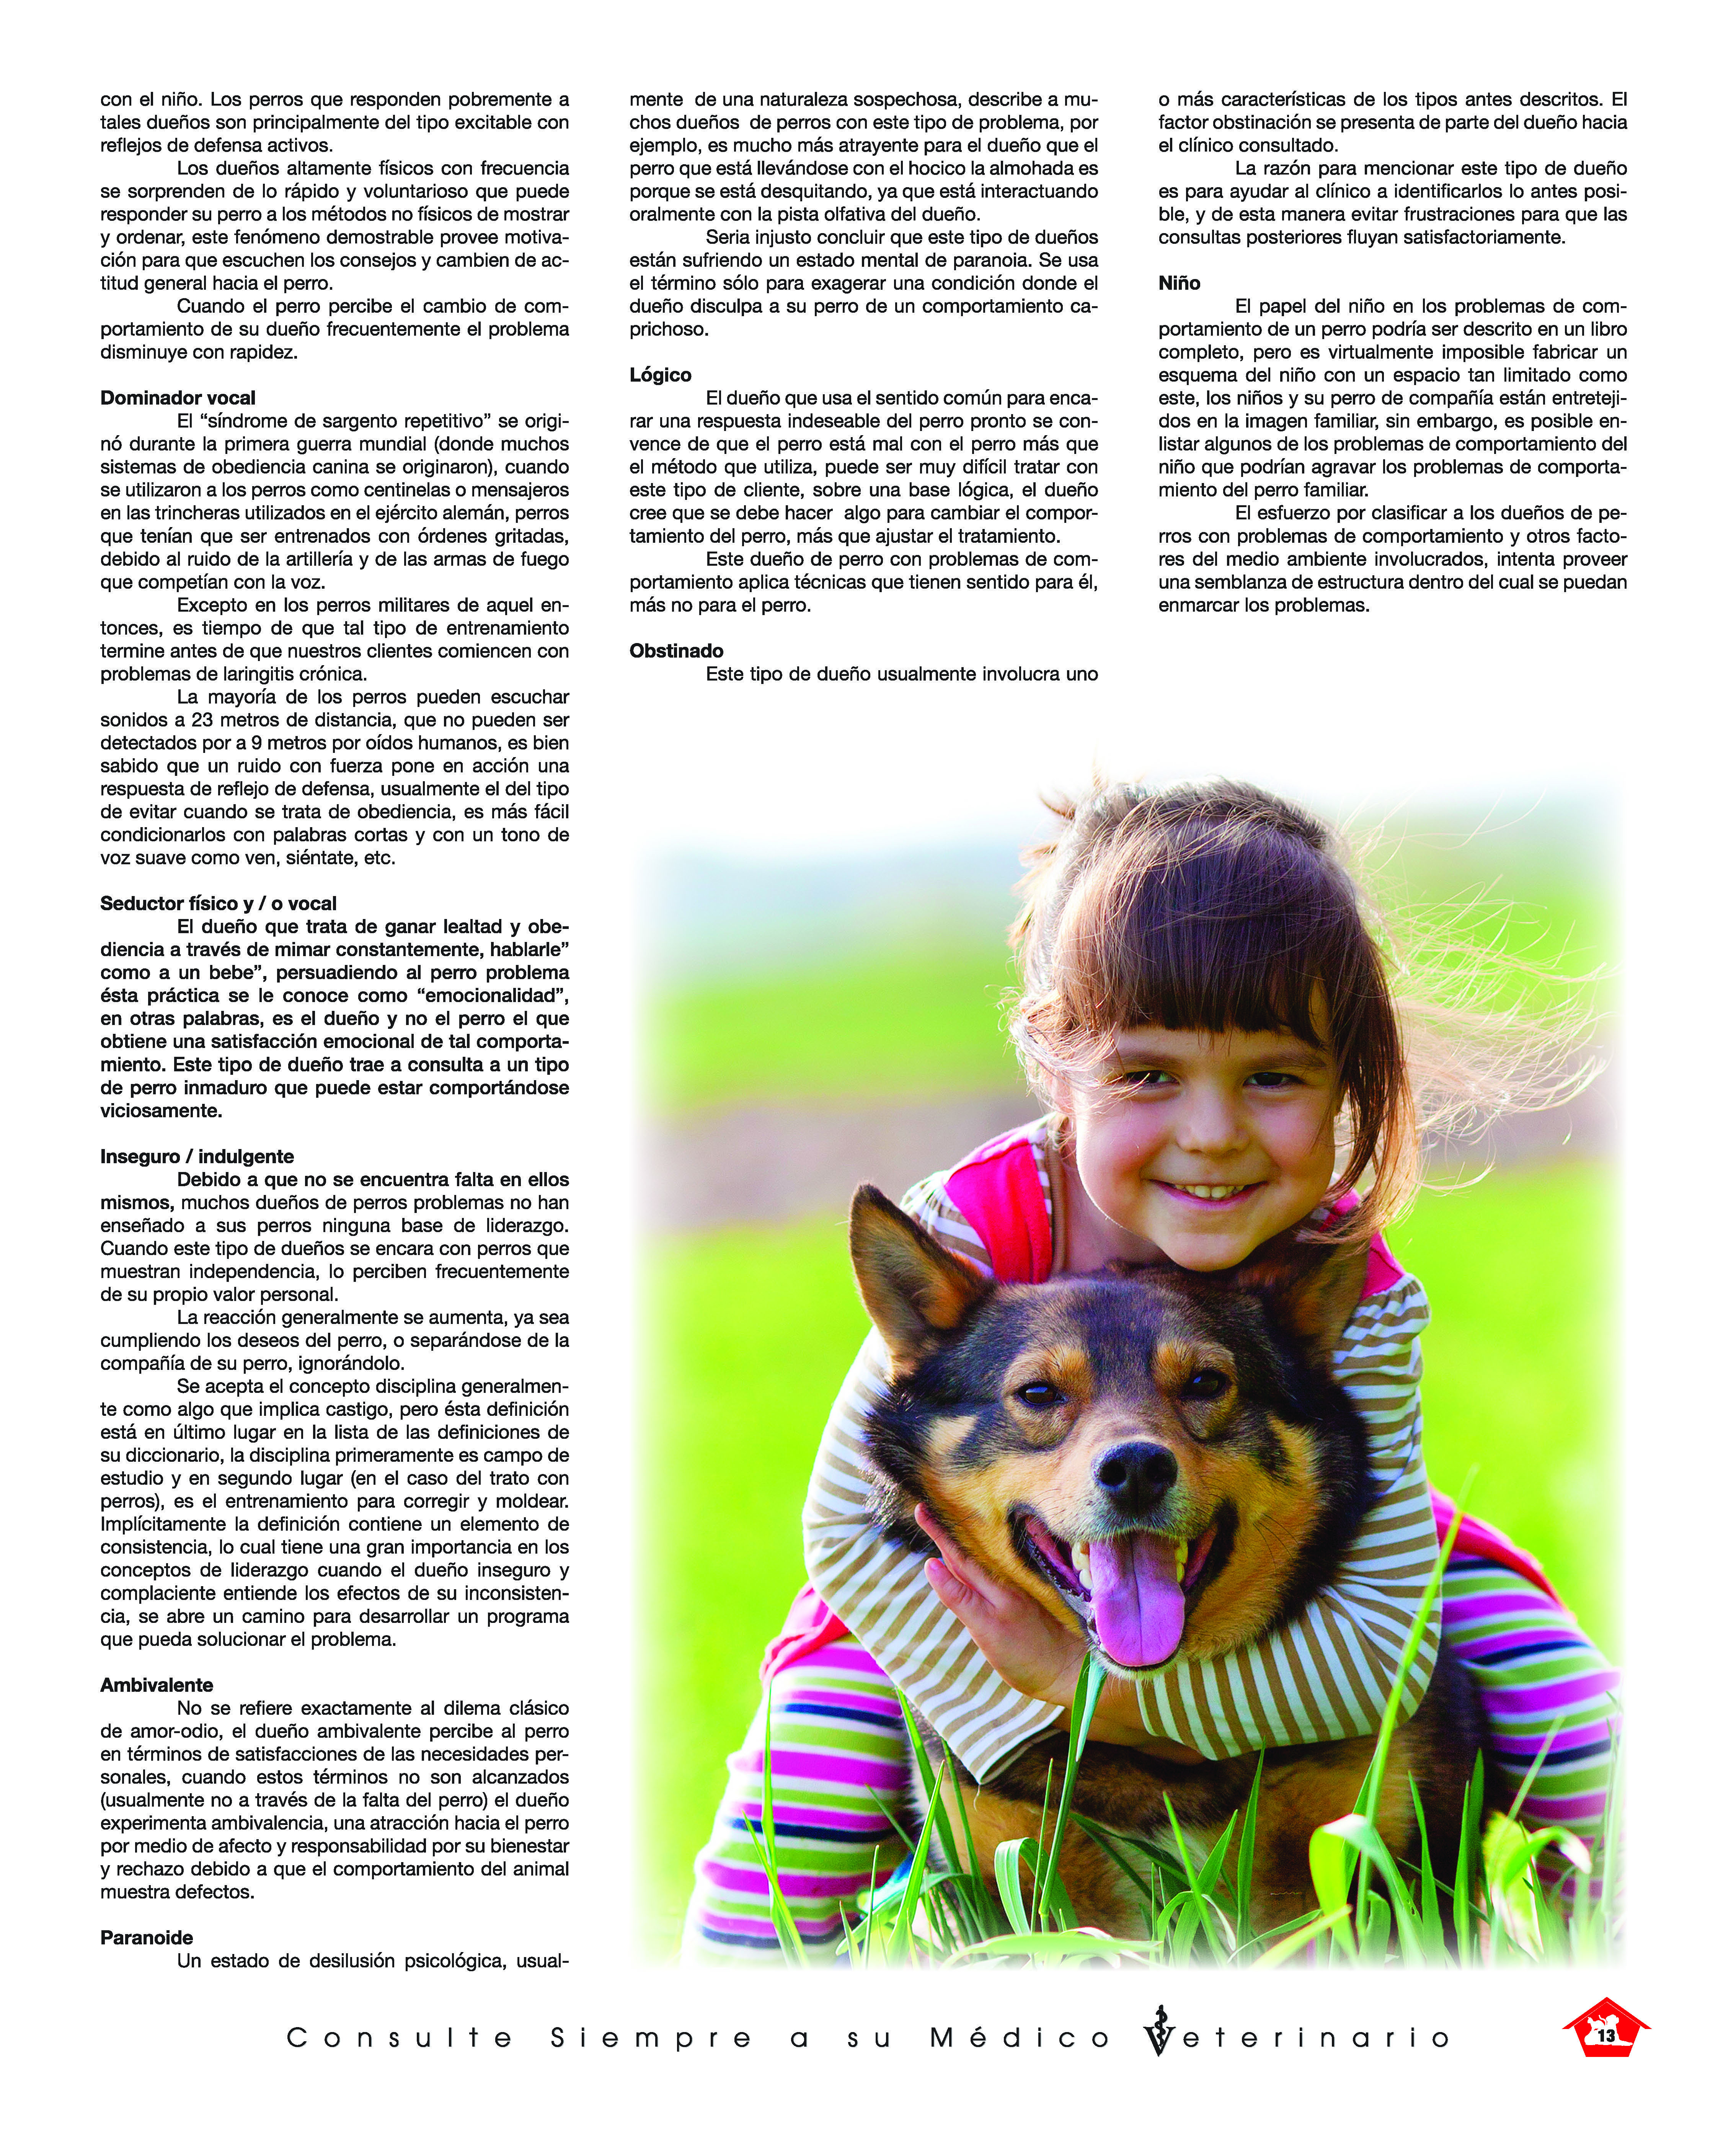 https://www.notican.com/wp-content/uploads/2019/10/Notican-Setiembre-2019-copy_Página_13.jpg